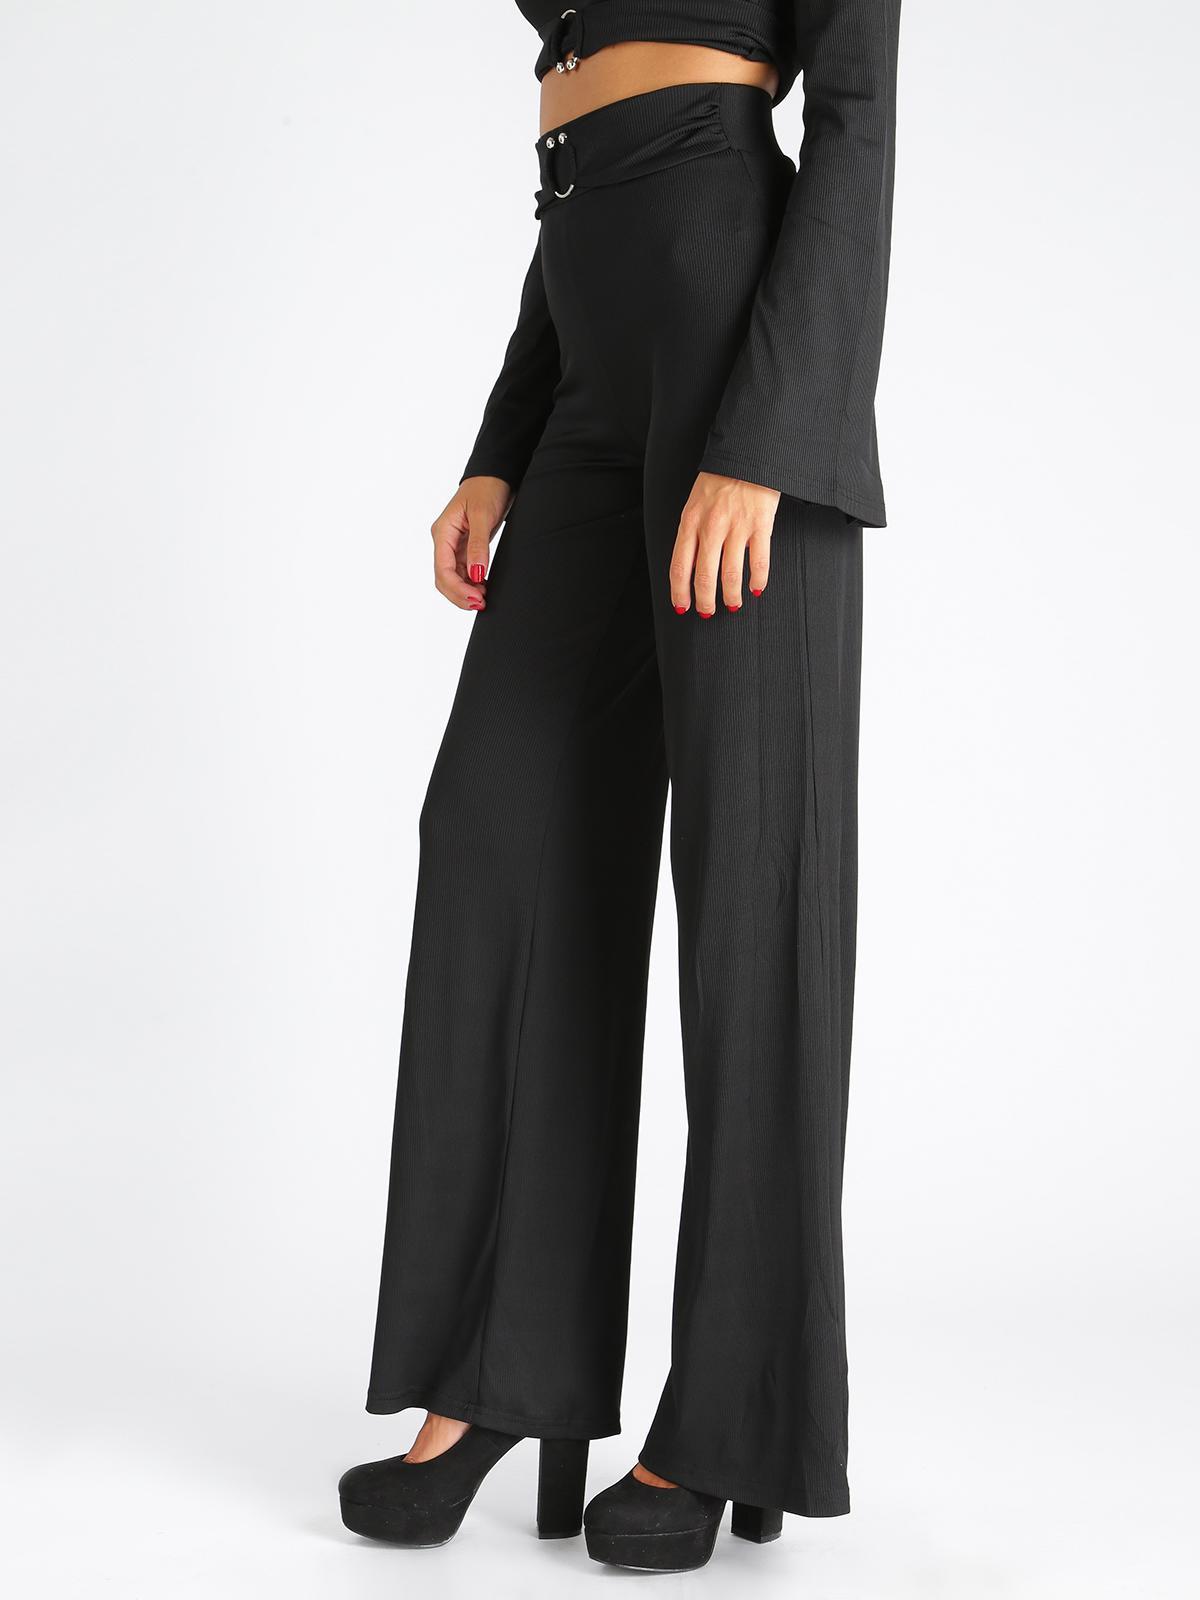 0b4cf5db85 Pantaloni a zampa vita alta elasticizzati solada | MecShopping